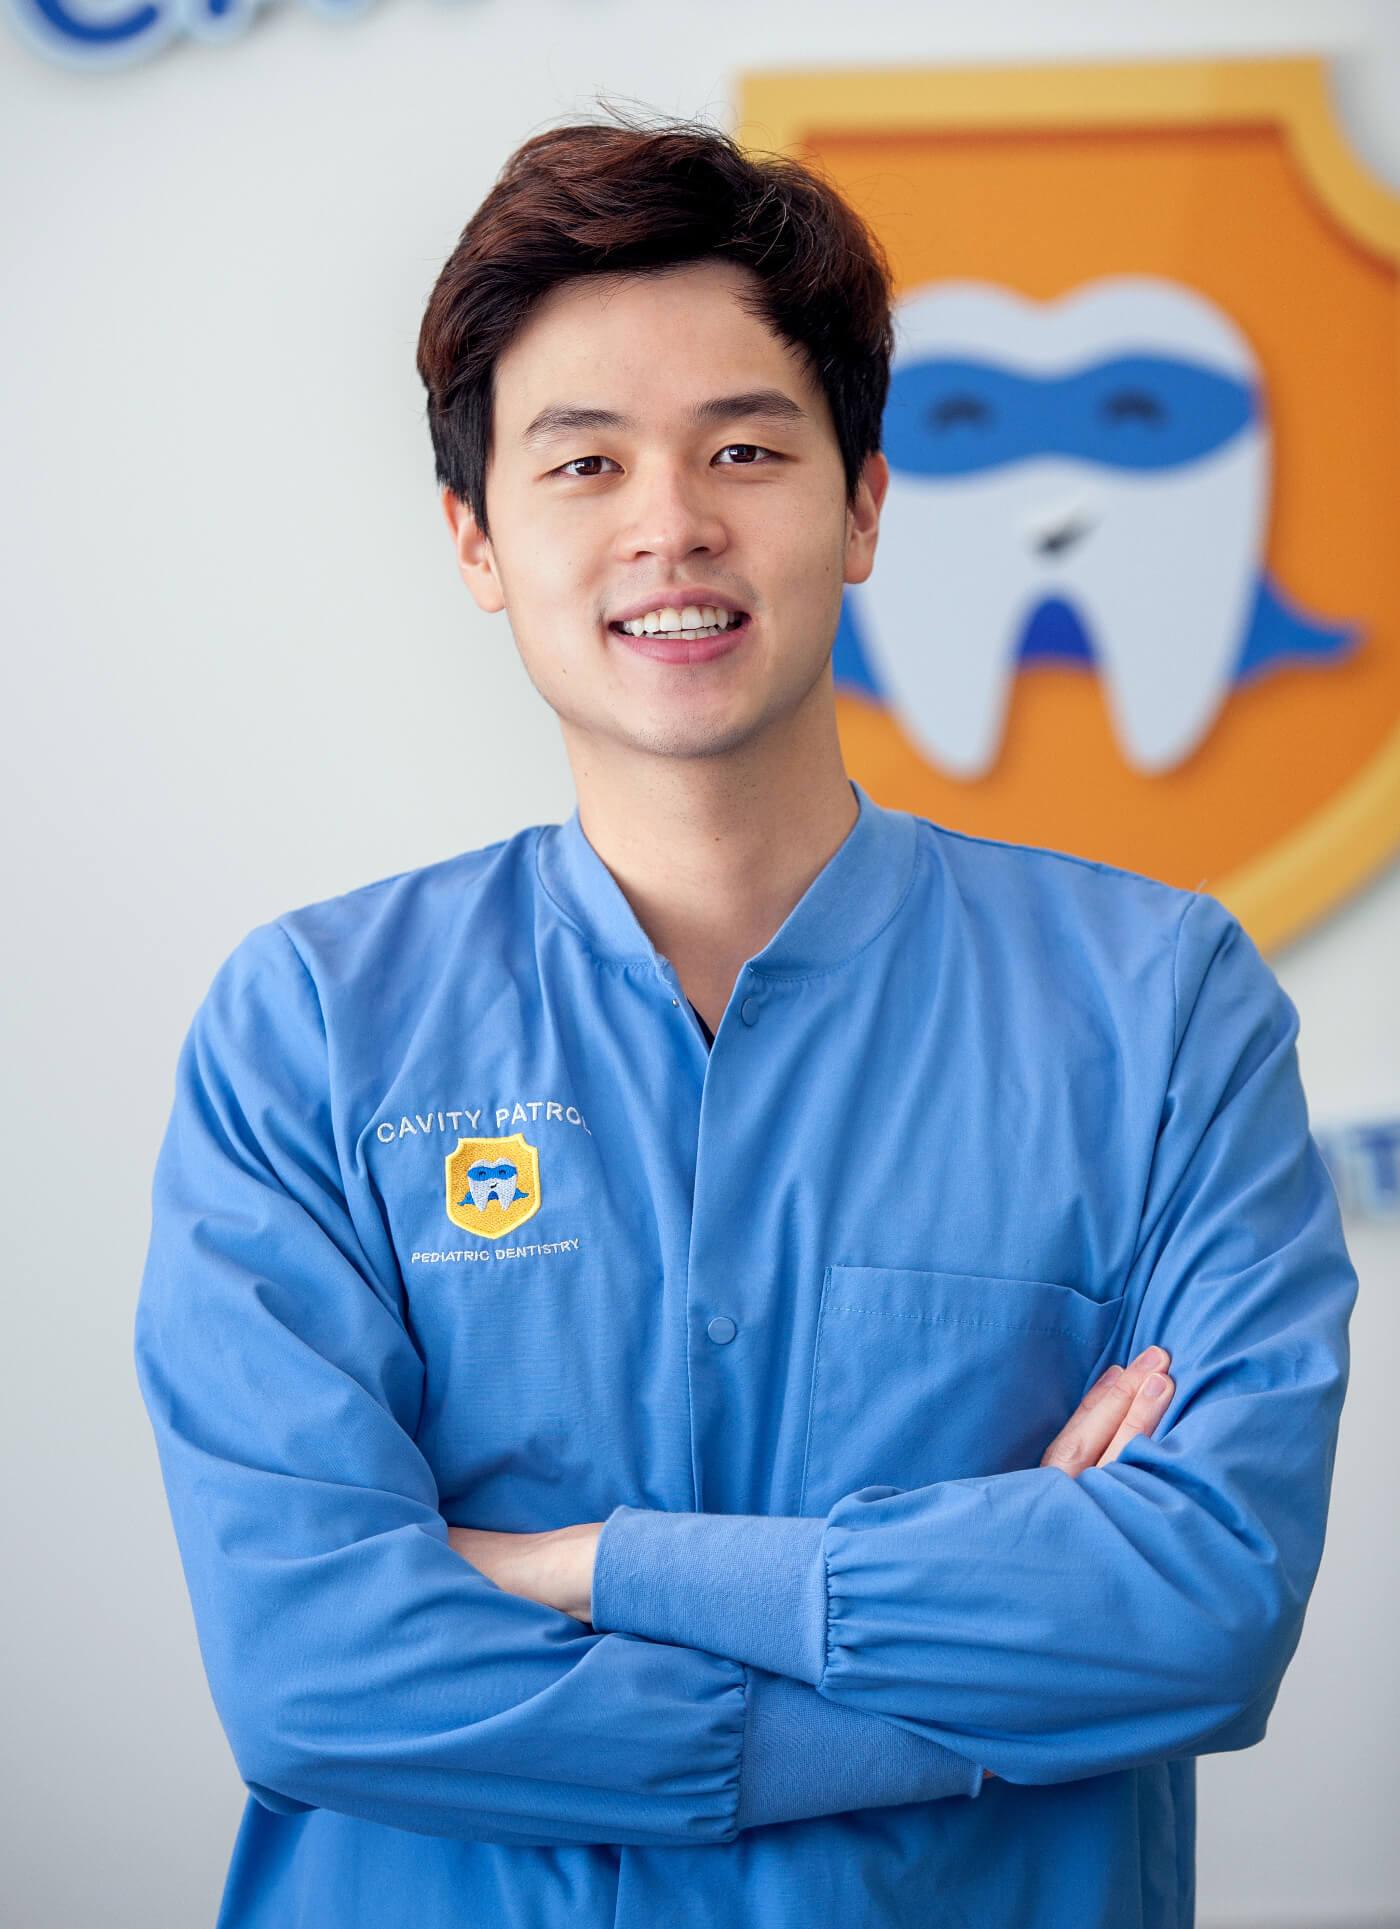 Dr. Chun Yin Wong